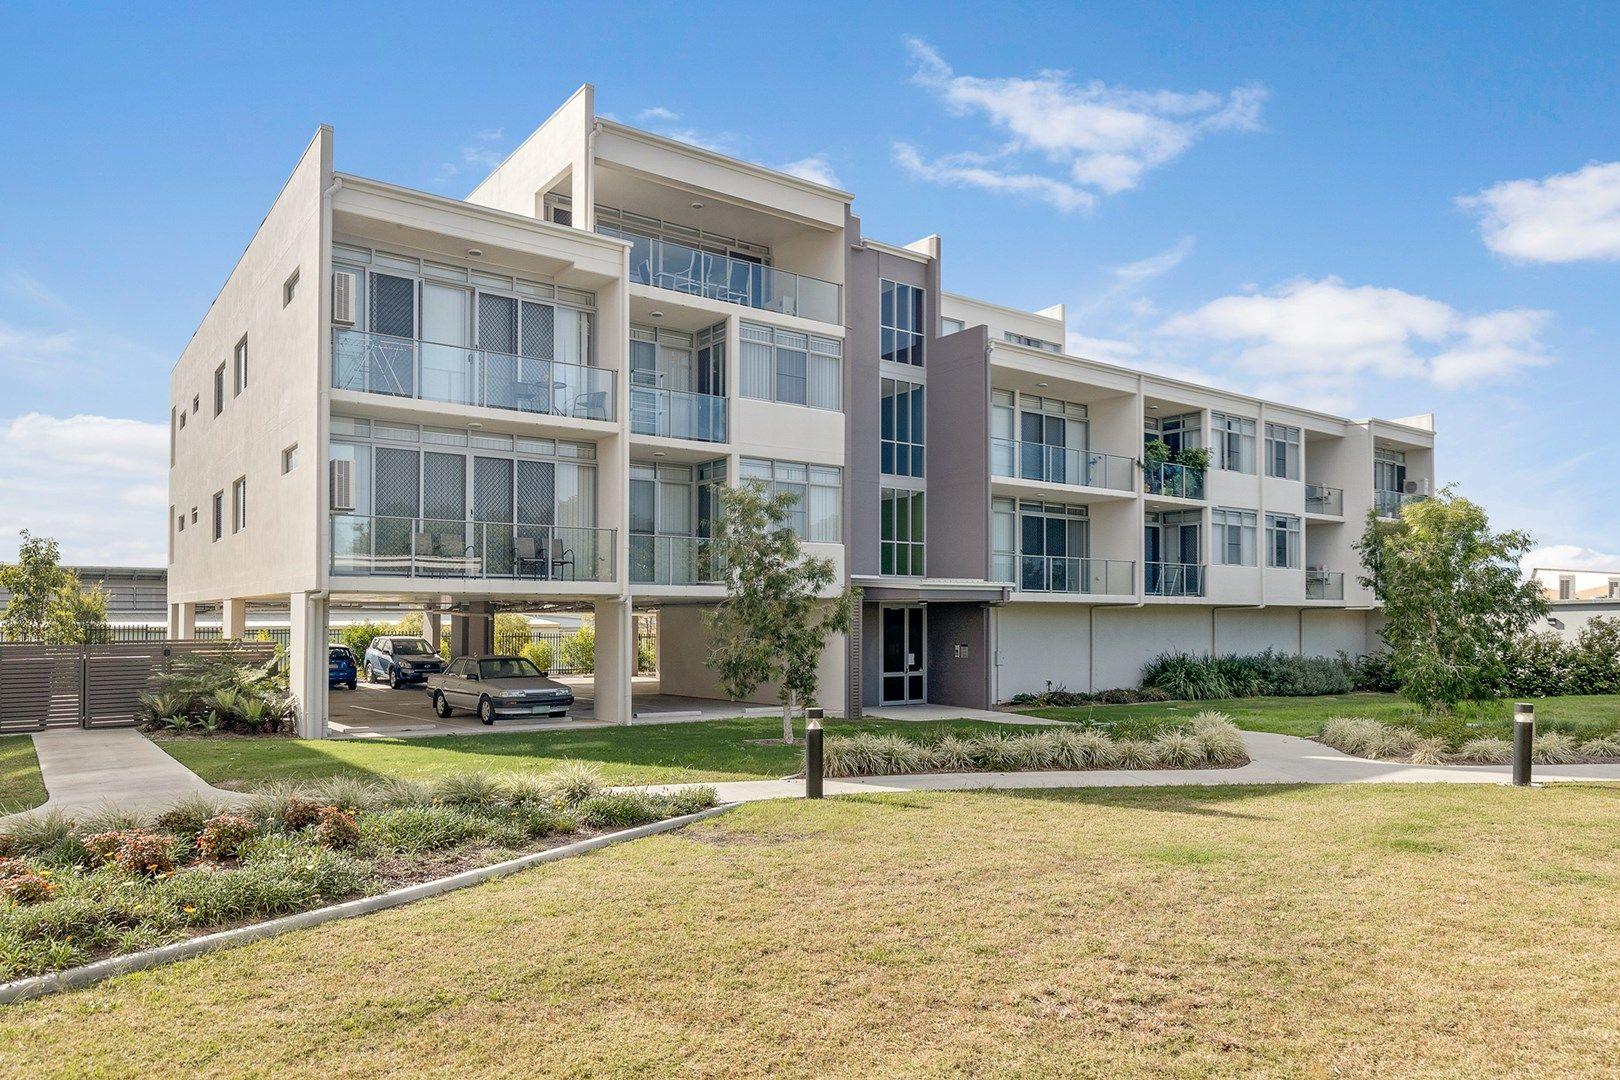 53/3 Mclennan Court, North Lakes QLD 4509, Image 0